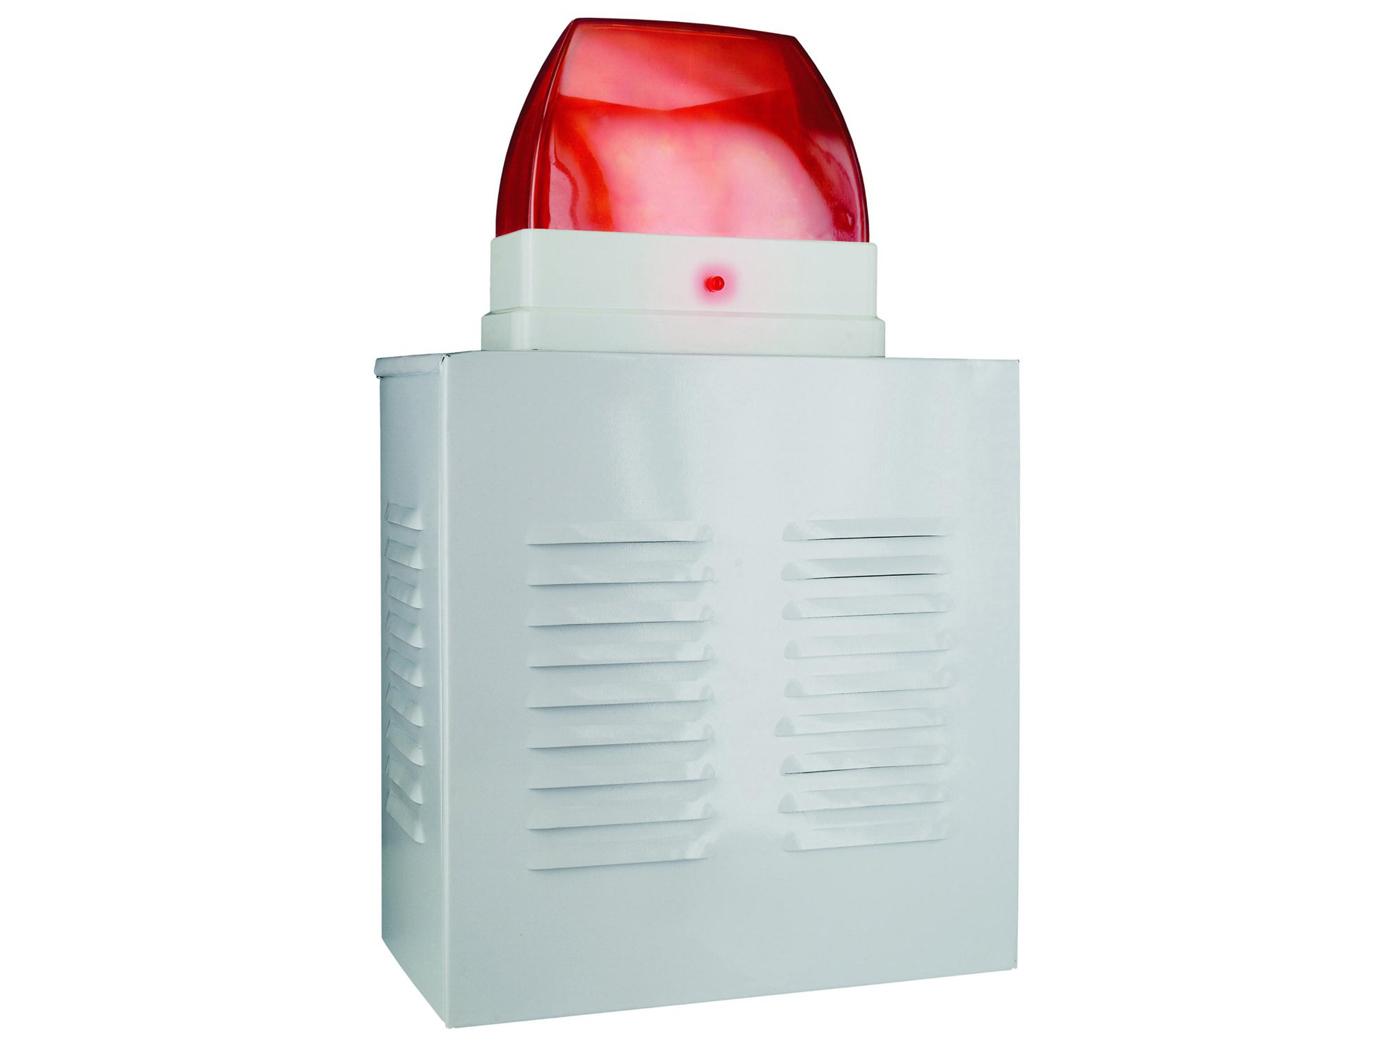 Dummy-Alarmanlagen-Fassadenbox-Aluminium-mit-Blink-LED-batteriebetr